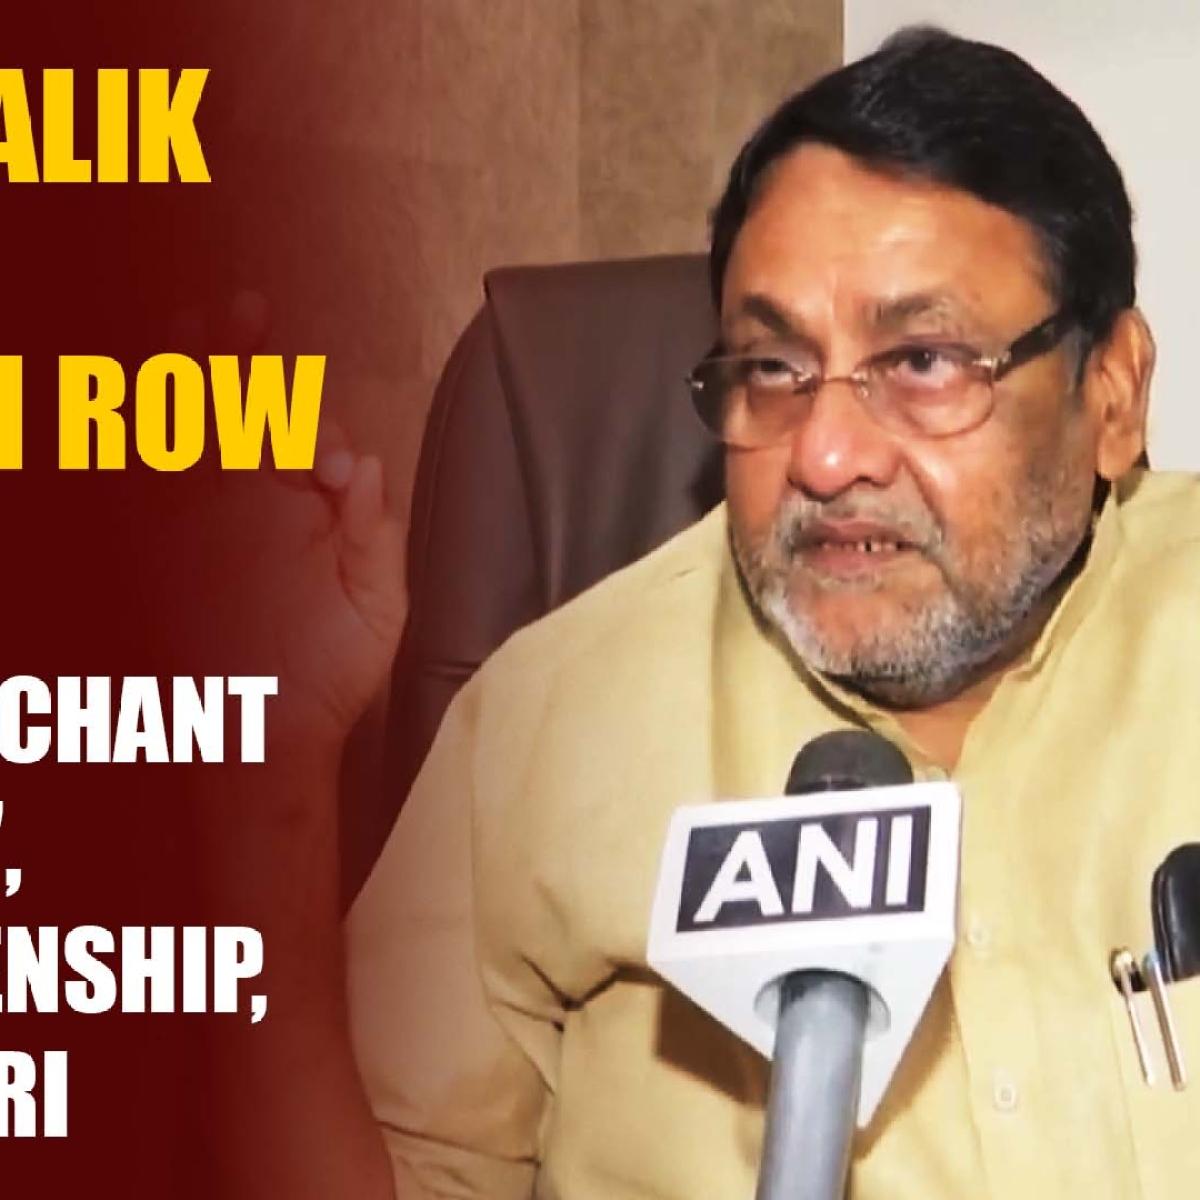 Nawab Malik on Adnan Sami row: Whoever will chant 'Jai Modi', will get citizenship, Padma Shri